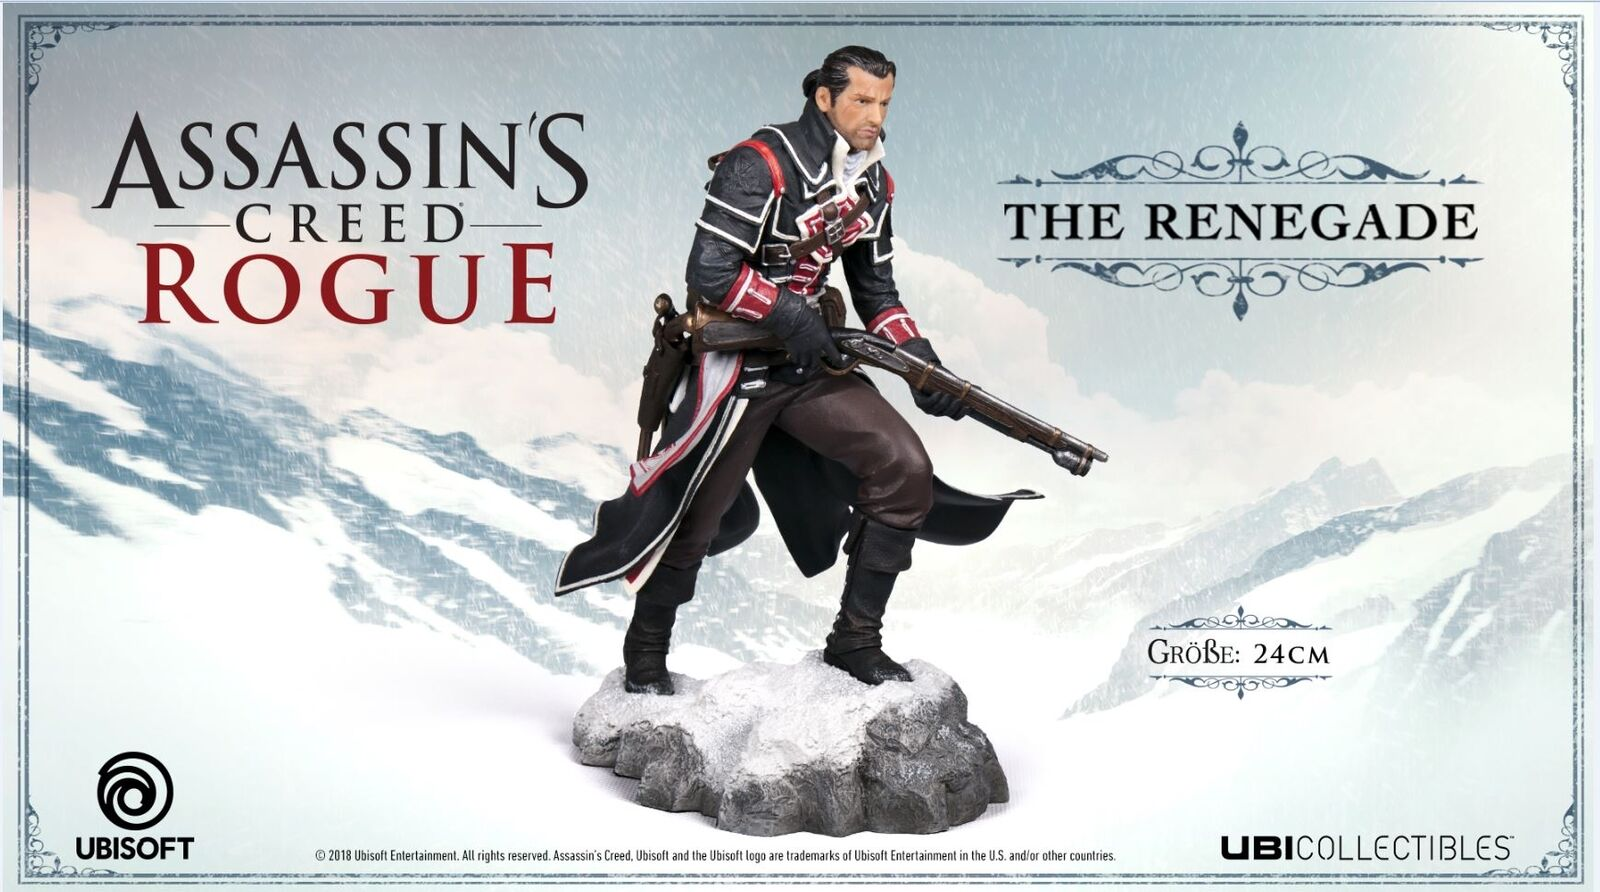 Assassin's Creed Rogue - The Renegade Shay Shay Shay 24 cm Neu & OVP 265d7a